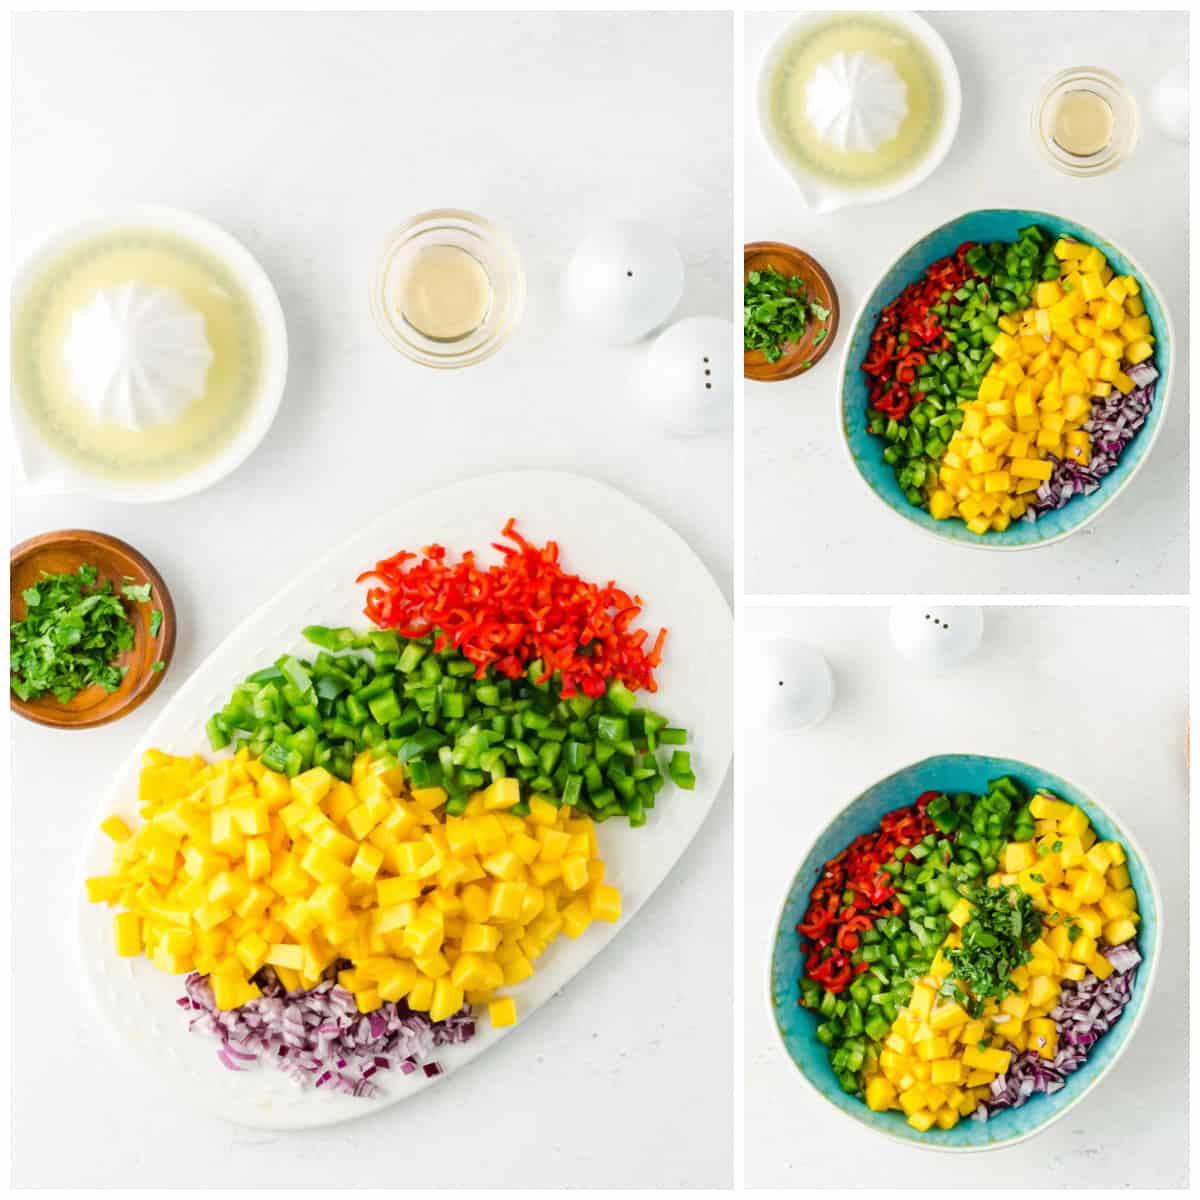 Step by step photos one how to make Mango Salsa